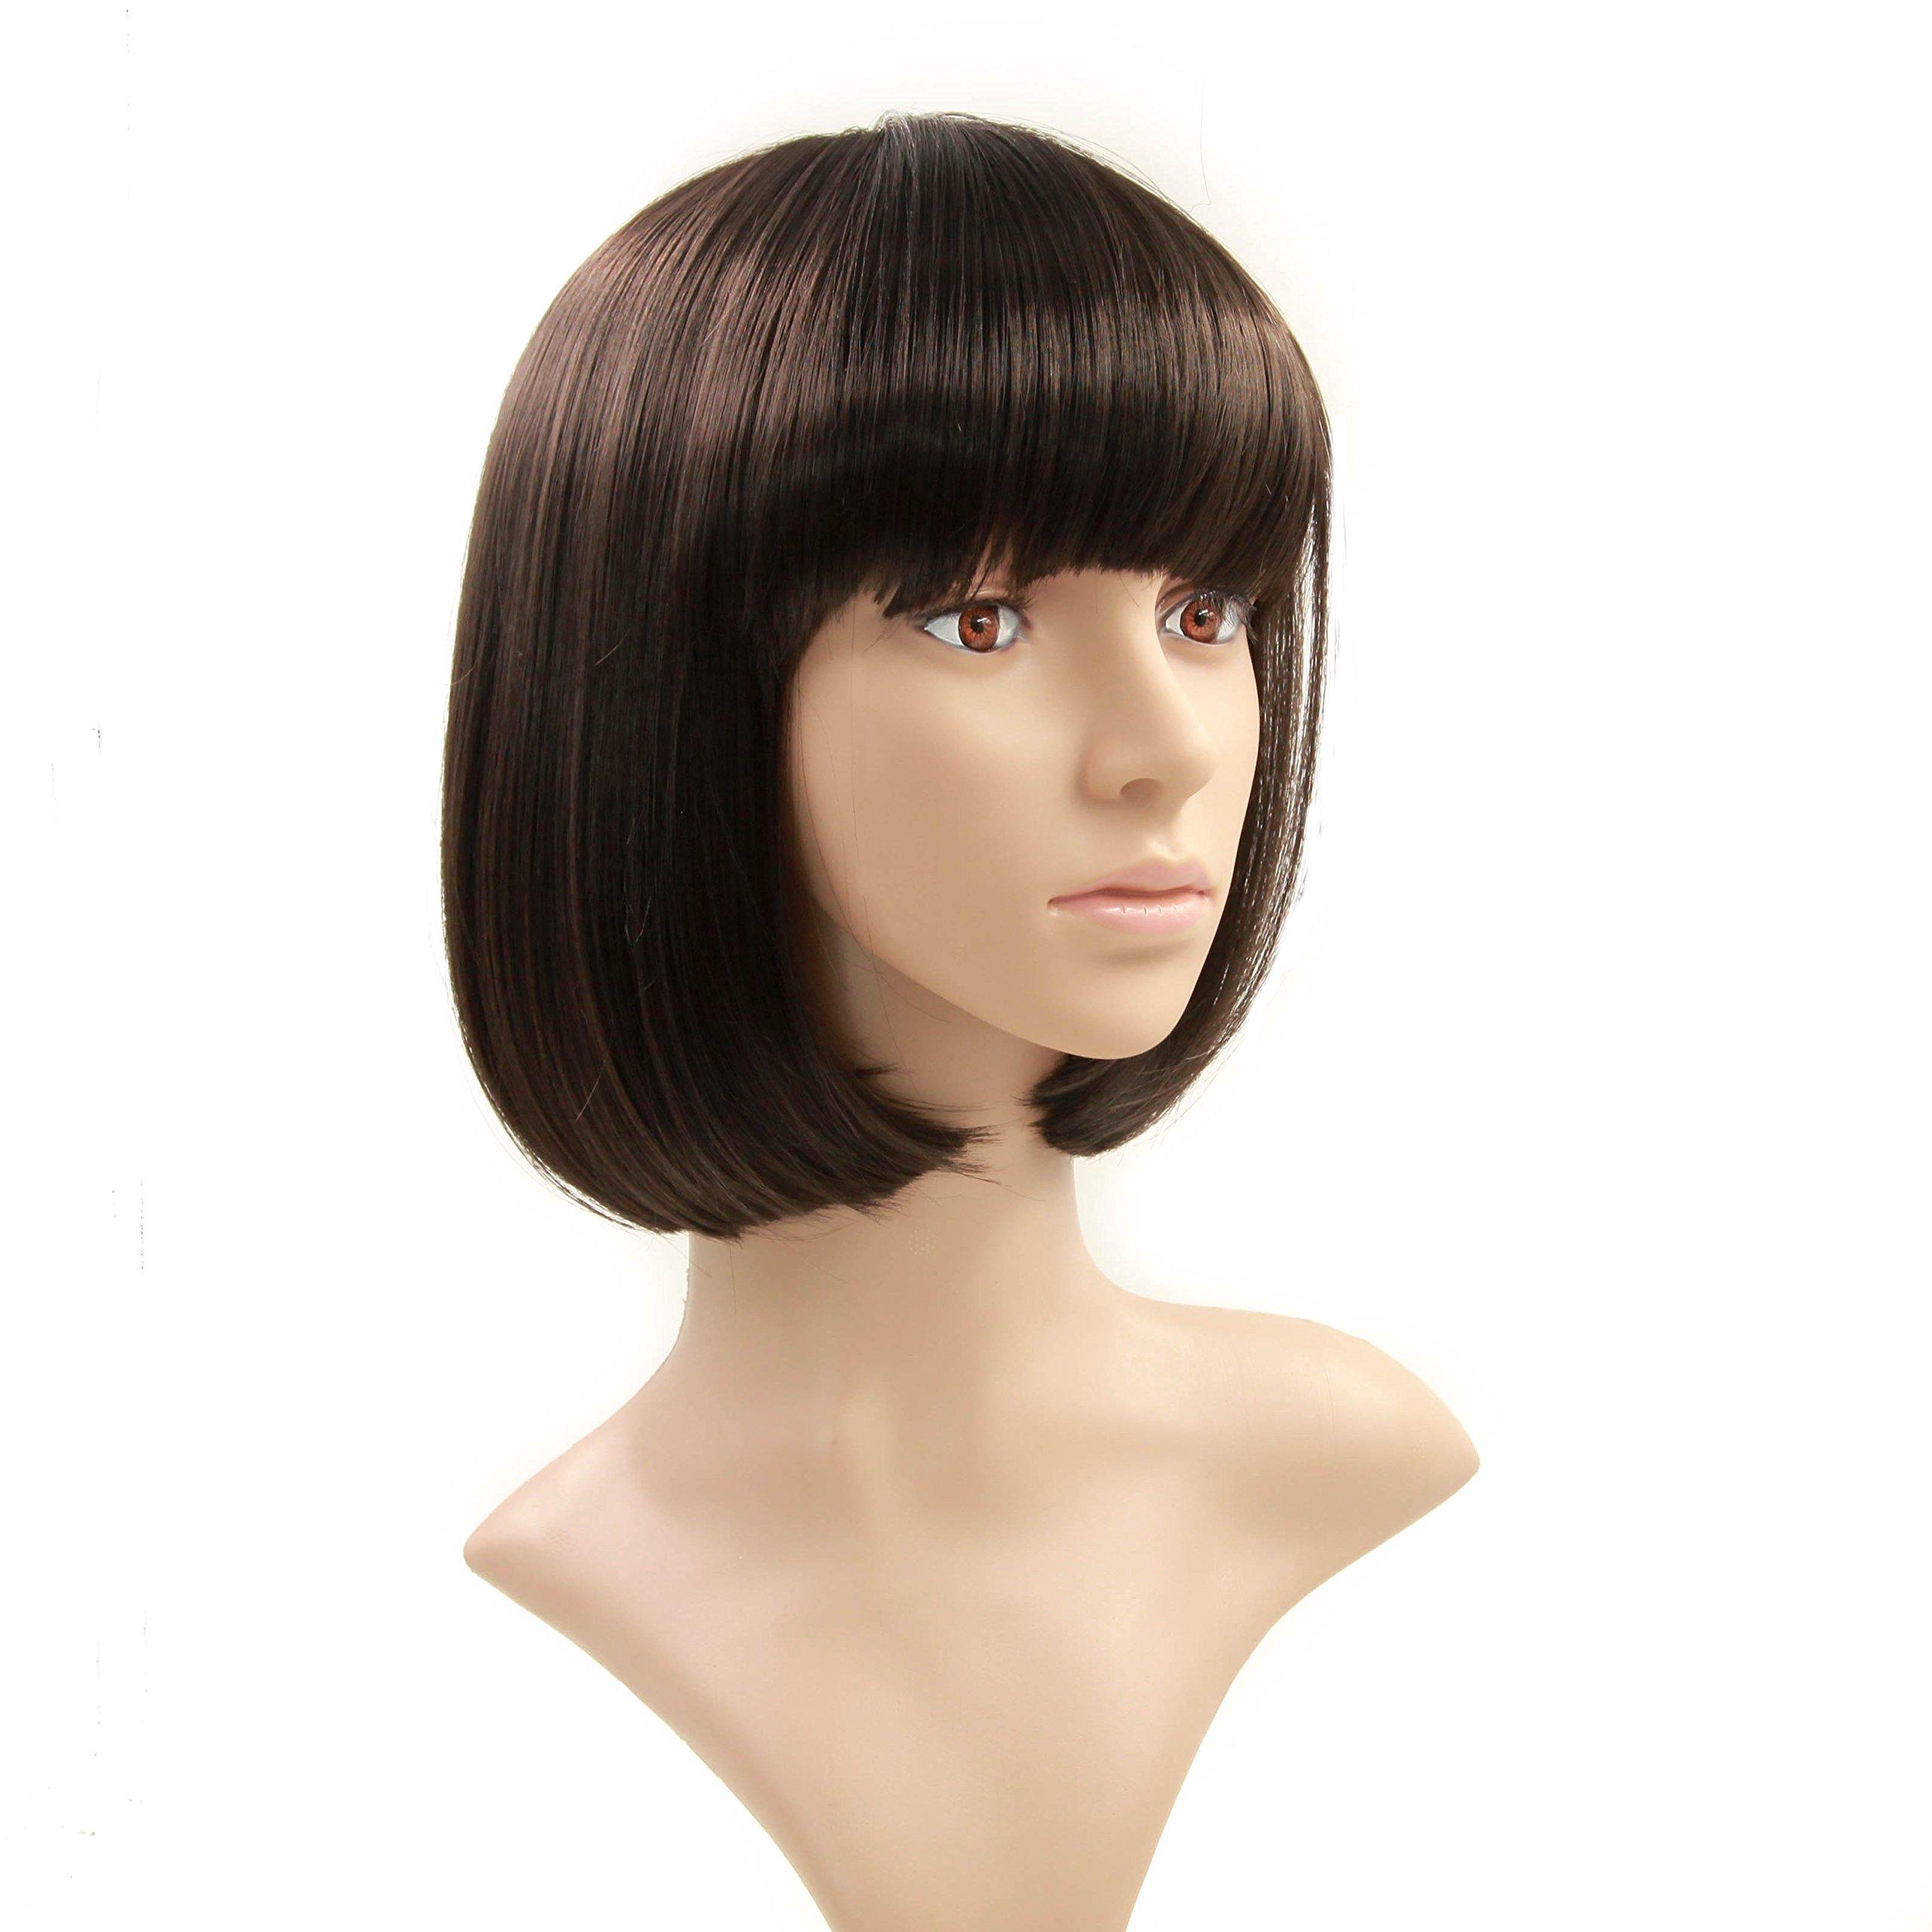 Charming Christmas Gift Short Bob Wigs Straight Bang Cosplay for Xmas Party Costume Wig Natural as Real hair 11 inch (Black)